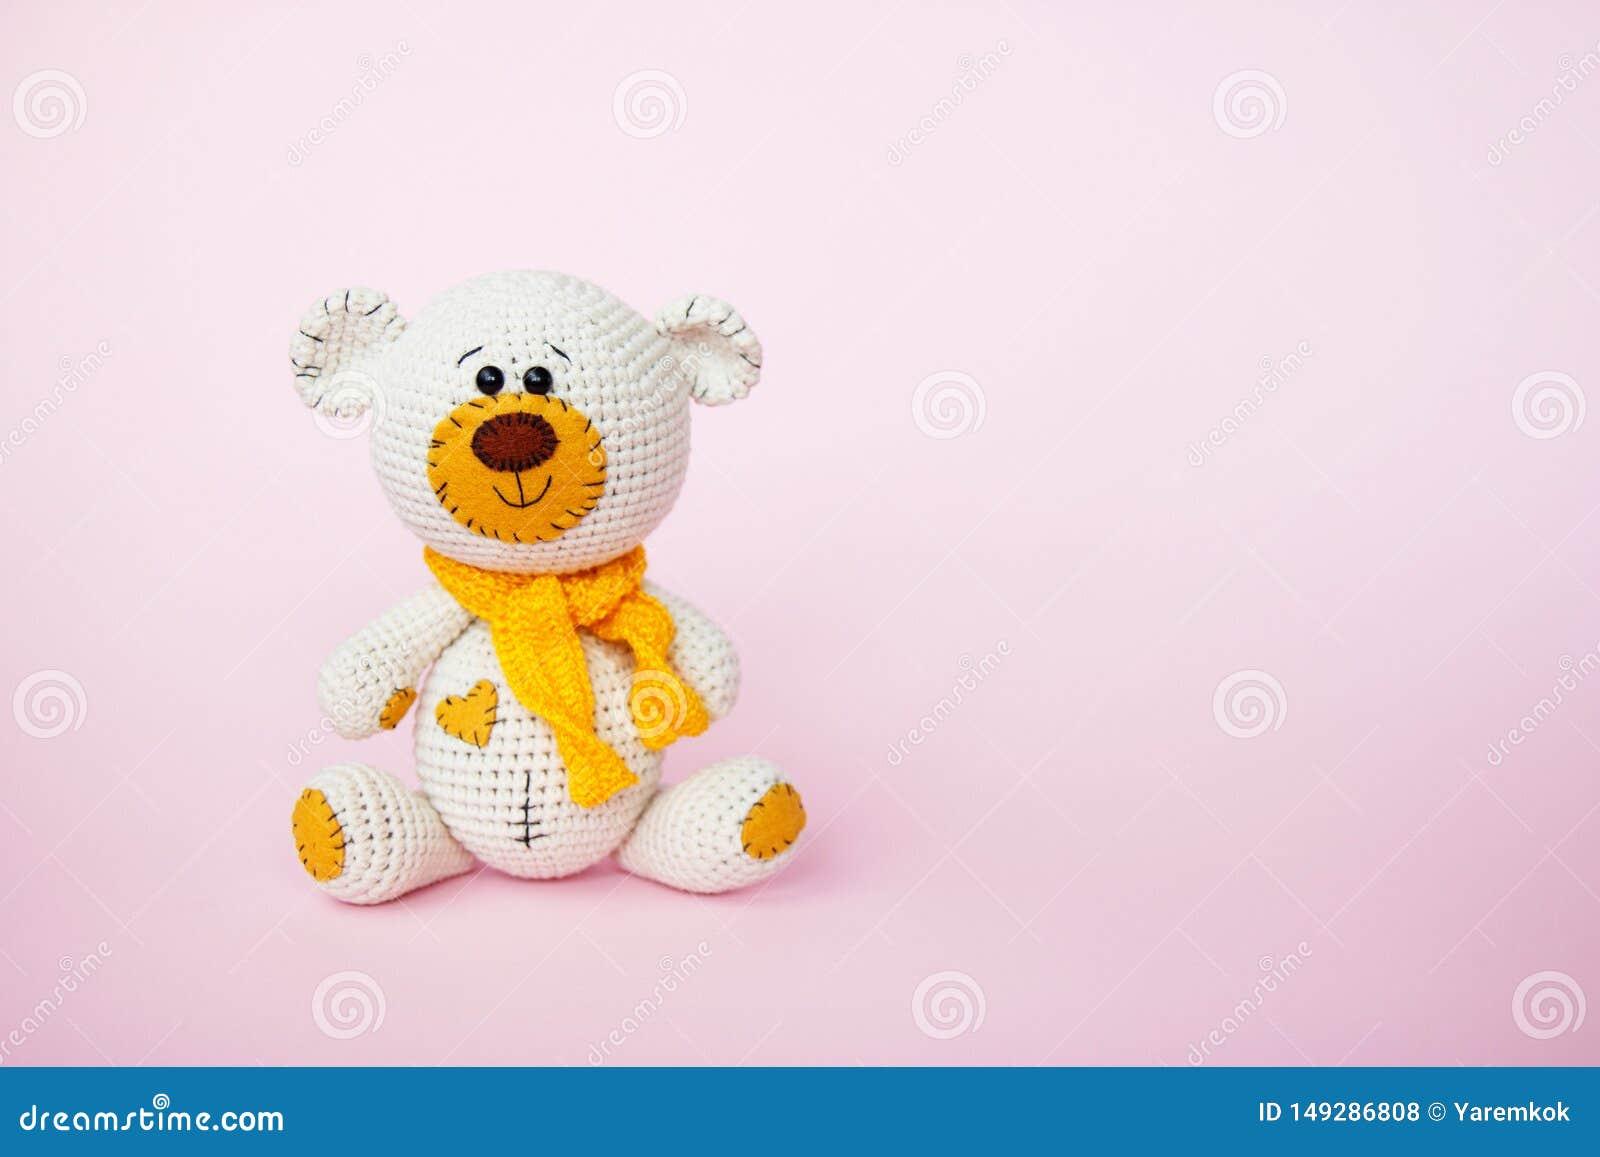 Amigurumi Crochet Teddy Bear (Pembe Ayıcık) Free Pattern Yapılışı ...   1155x1600